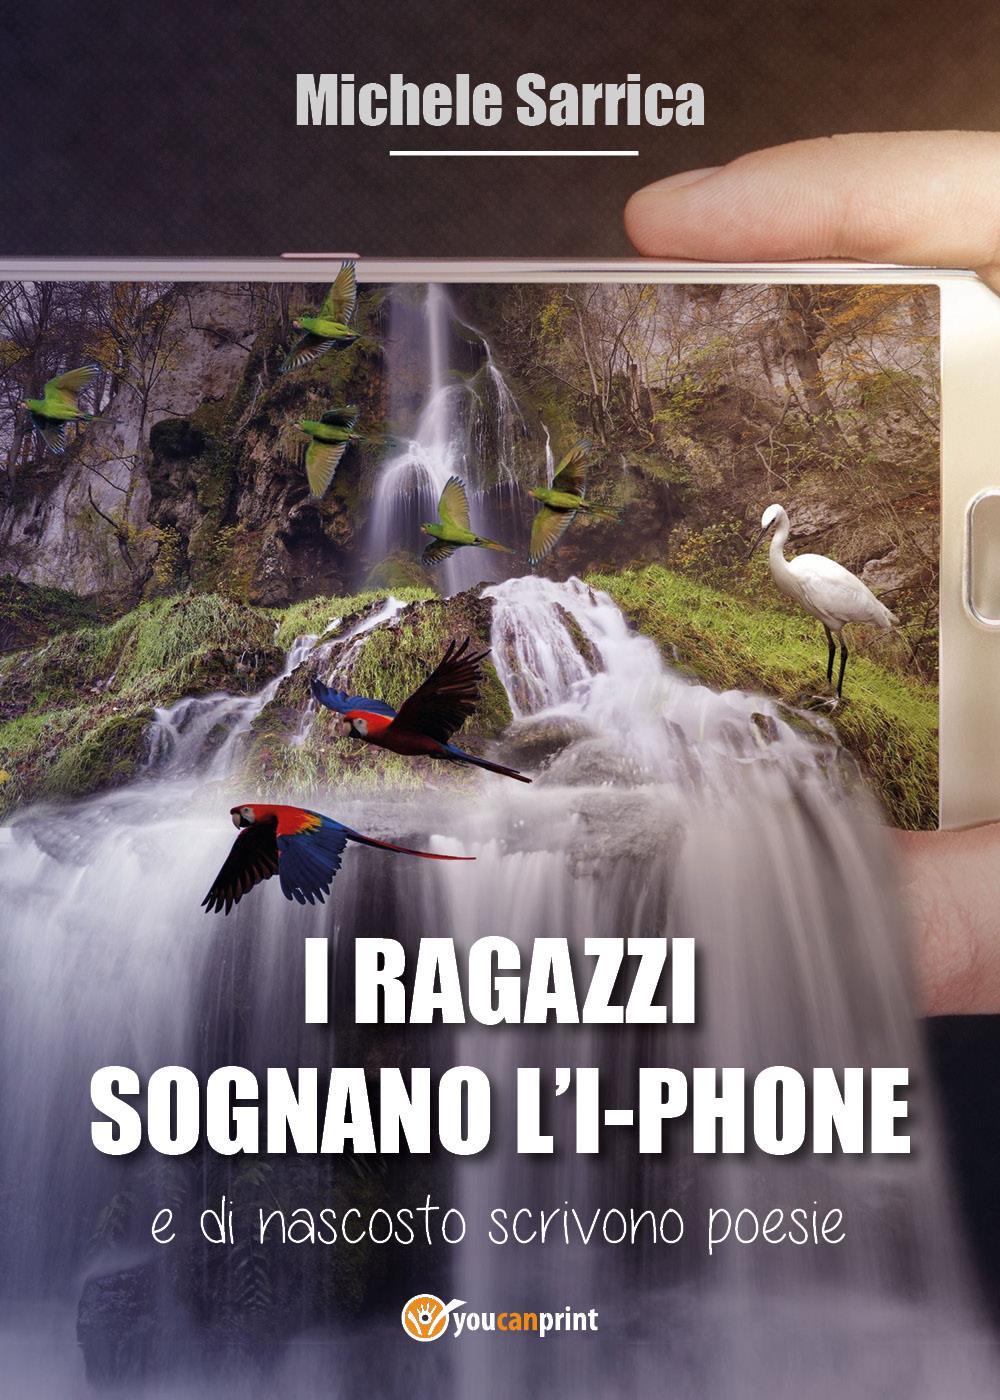 I RAGAZZI SOGNANO L'I-PHONE